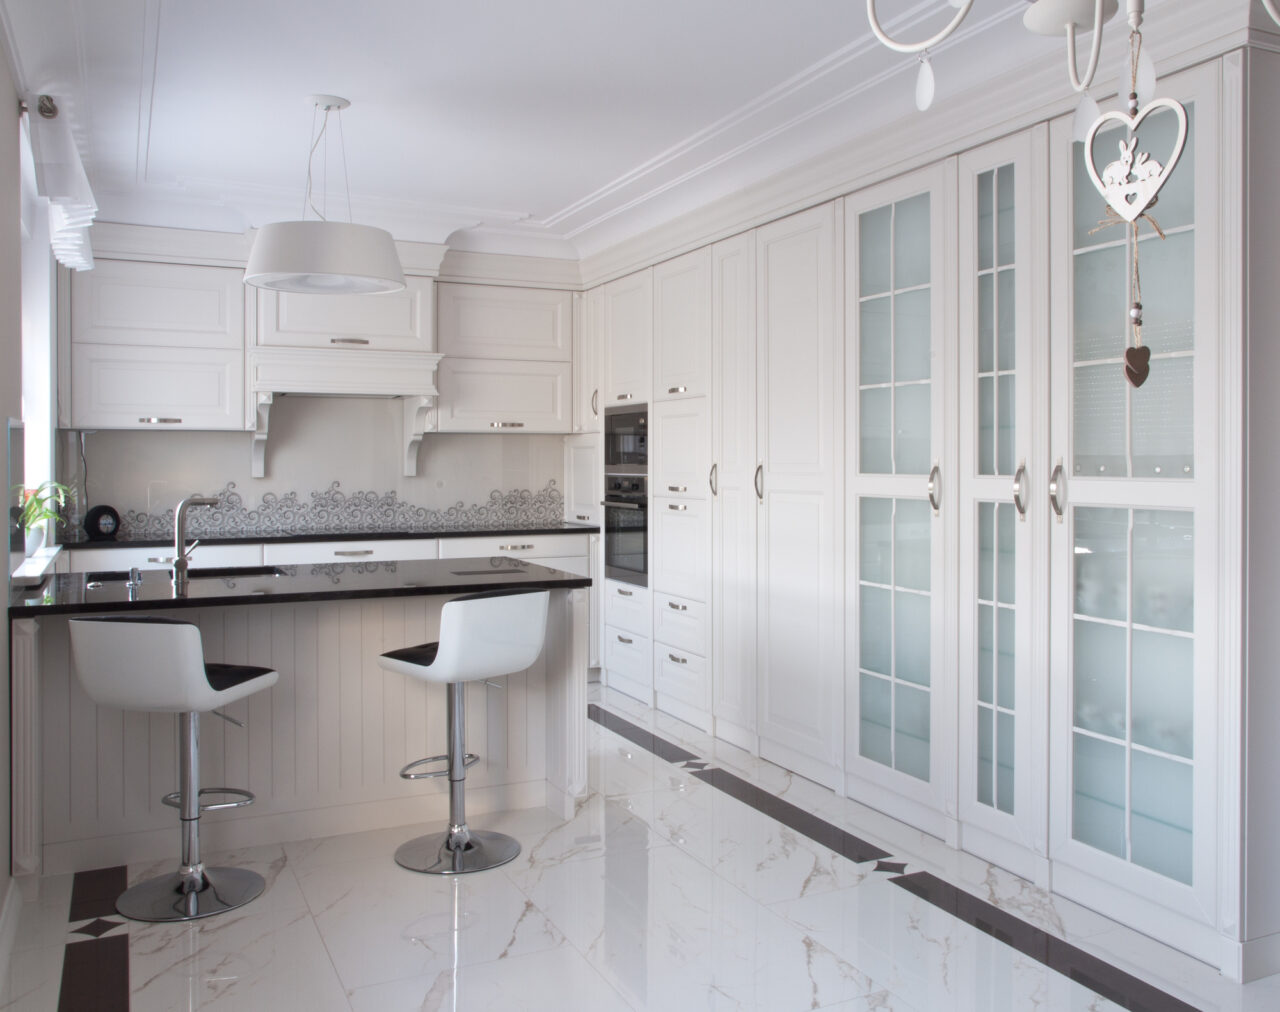 Изработка на кујни по нарачка - DM-130039